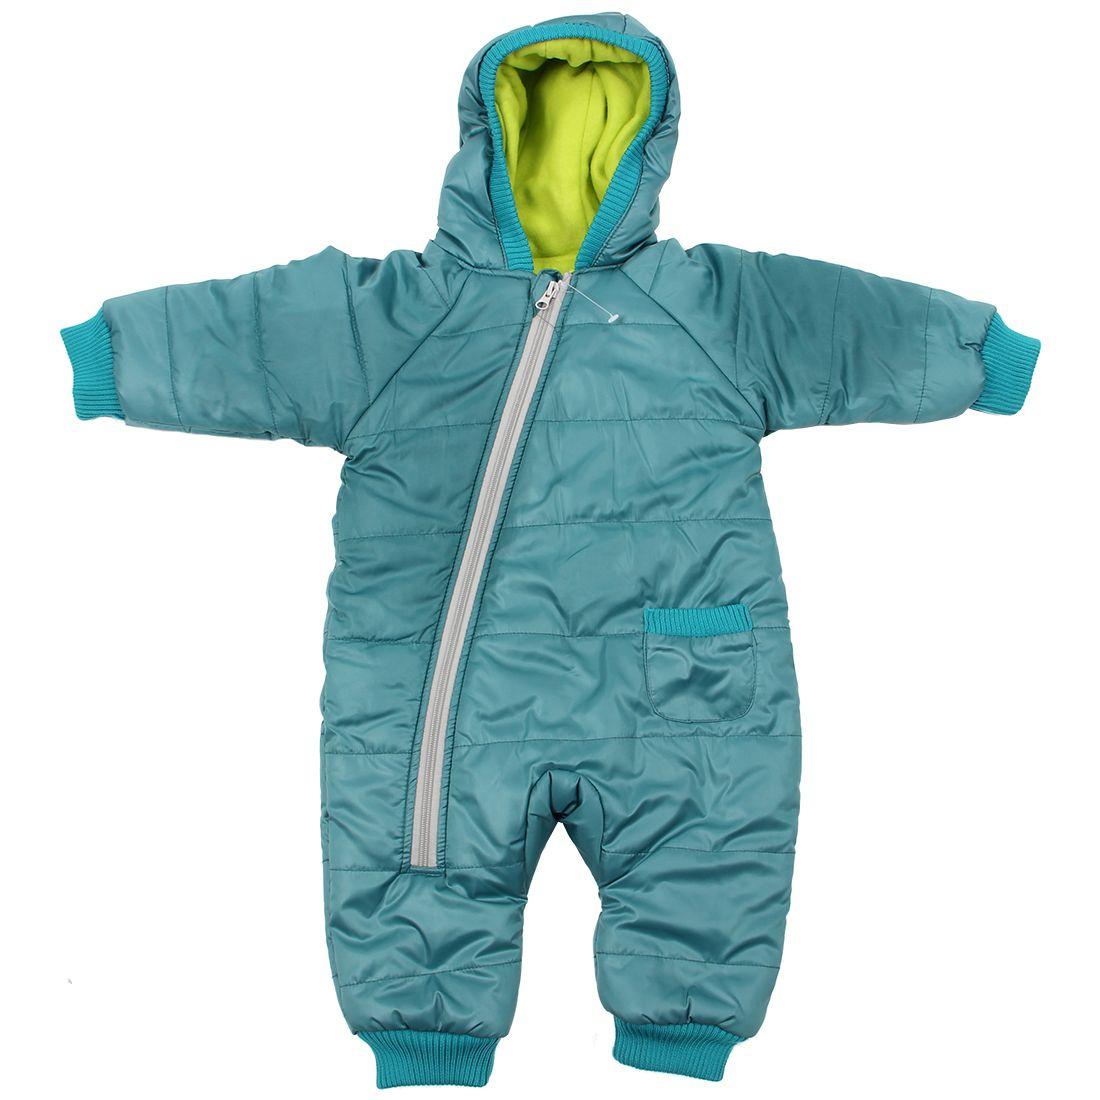 Winter Baby Girl Boy Kid Toddler Snowsuit Coat Jacket Jumper Outwear Clothes 1PC blue 6-12m